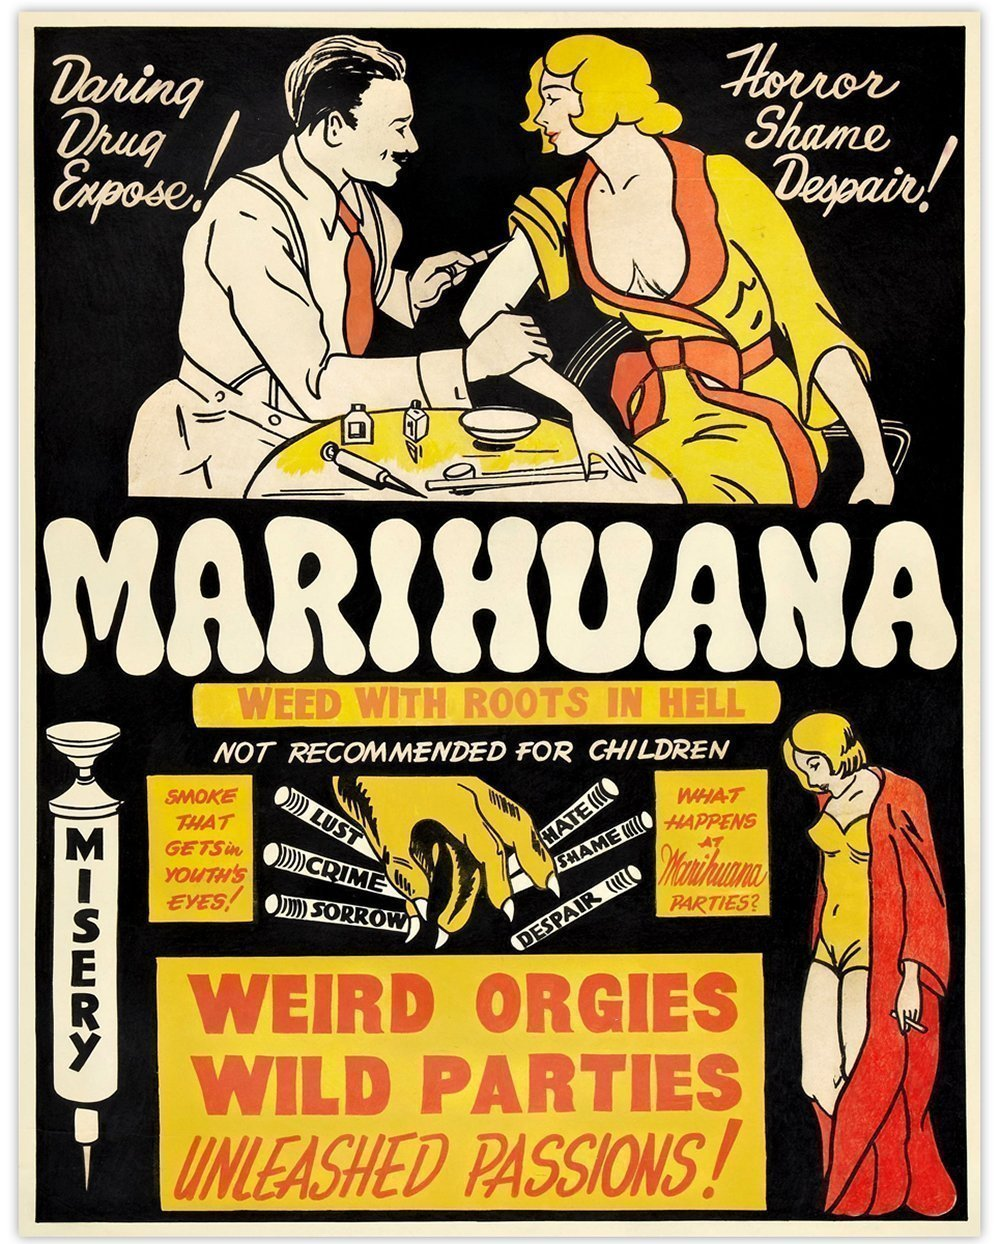 Amazon.com: Marihuana - 11x14 Unframed Art Print - Great Gift for ...